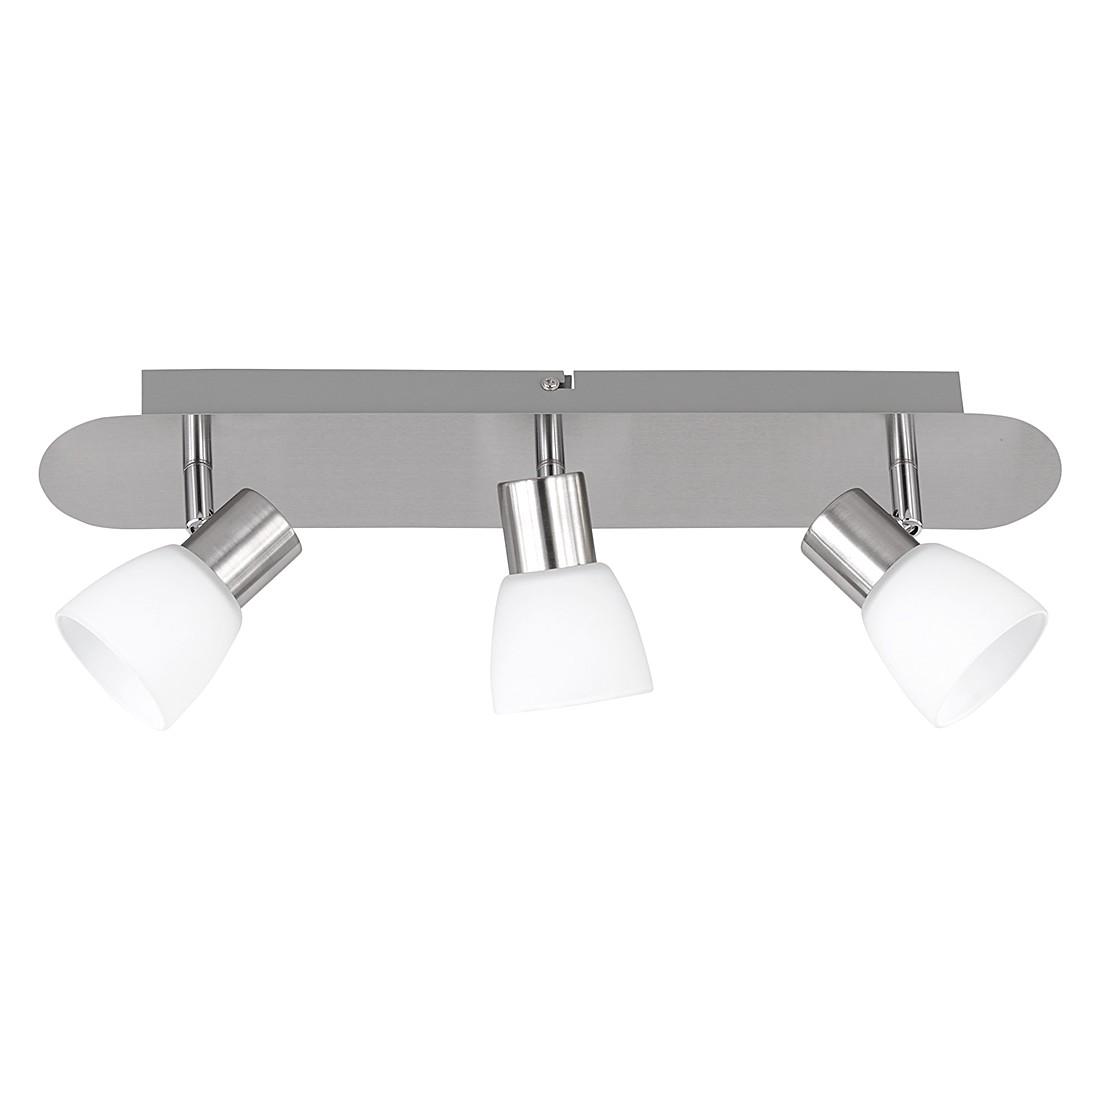 LED-plafondlamp - nikkelkleurig 3x4,5W, Trio